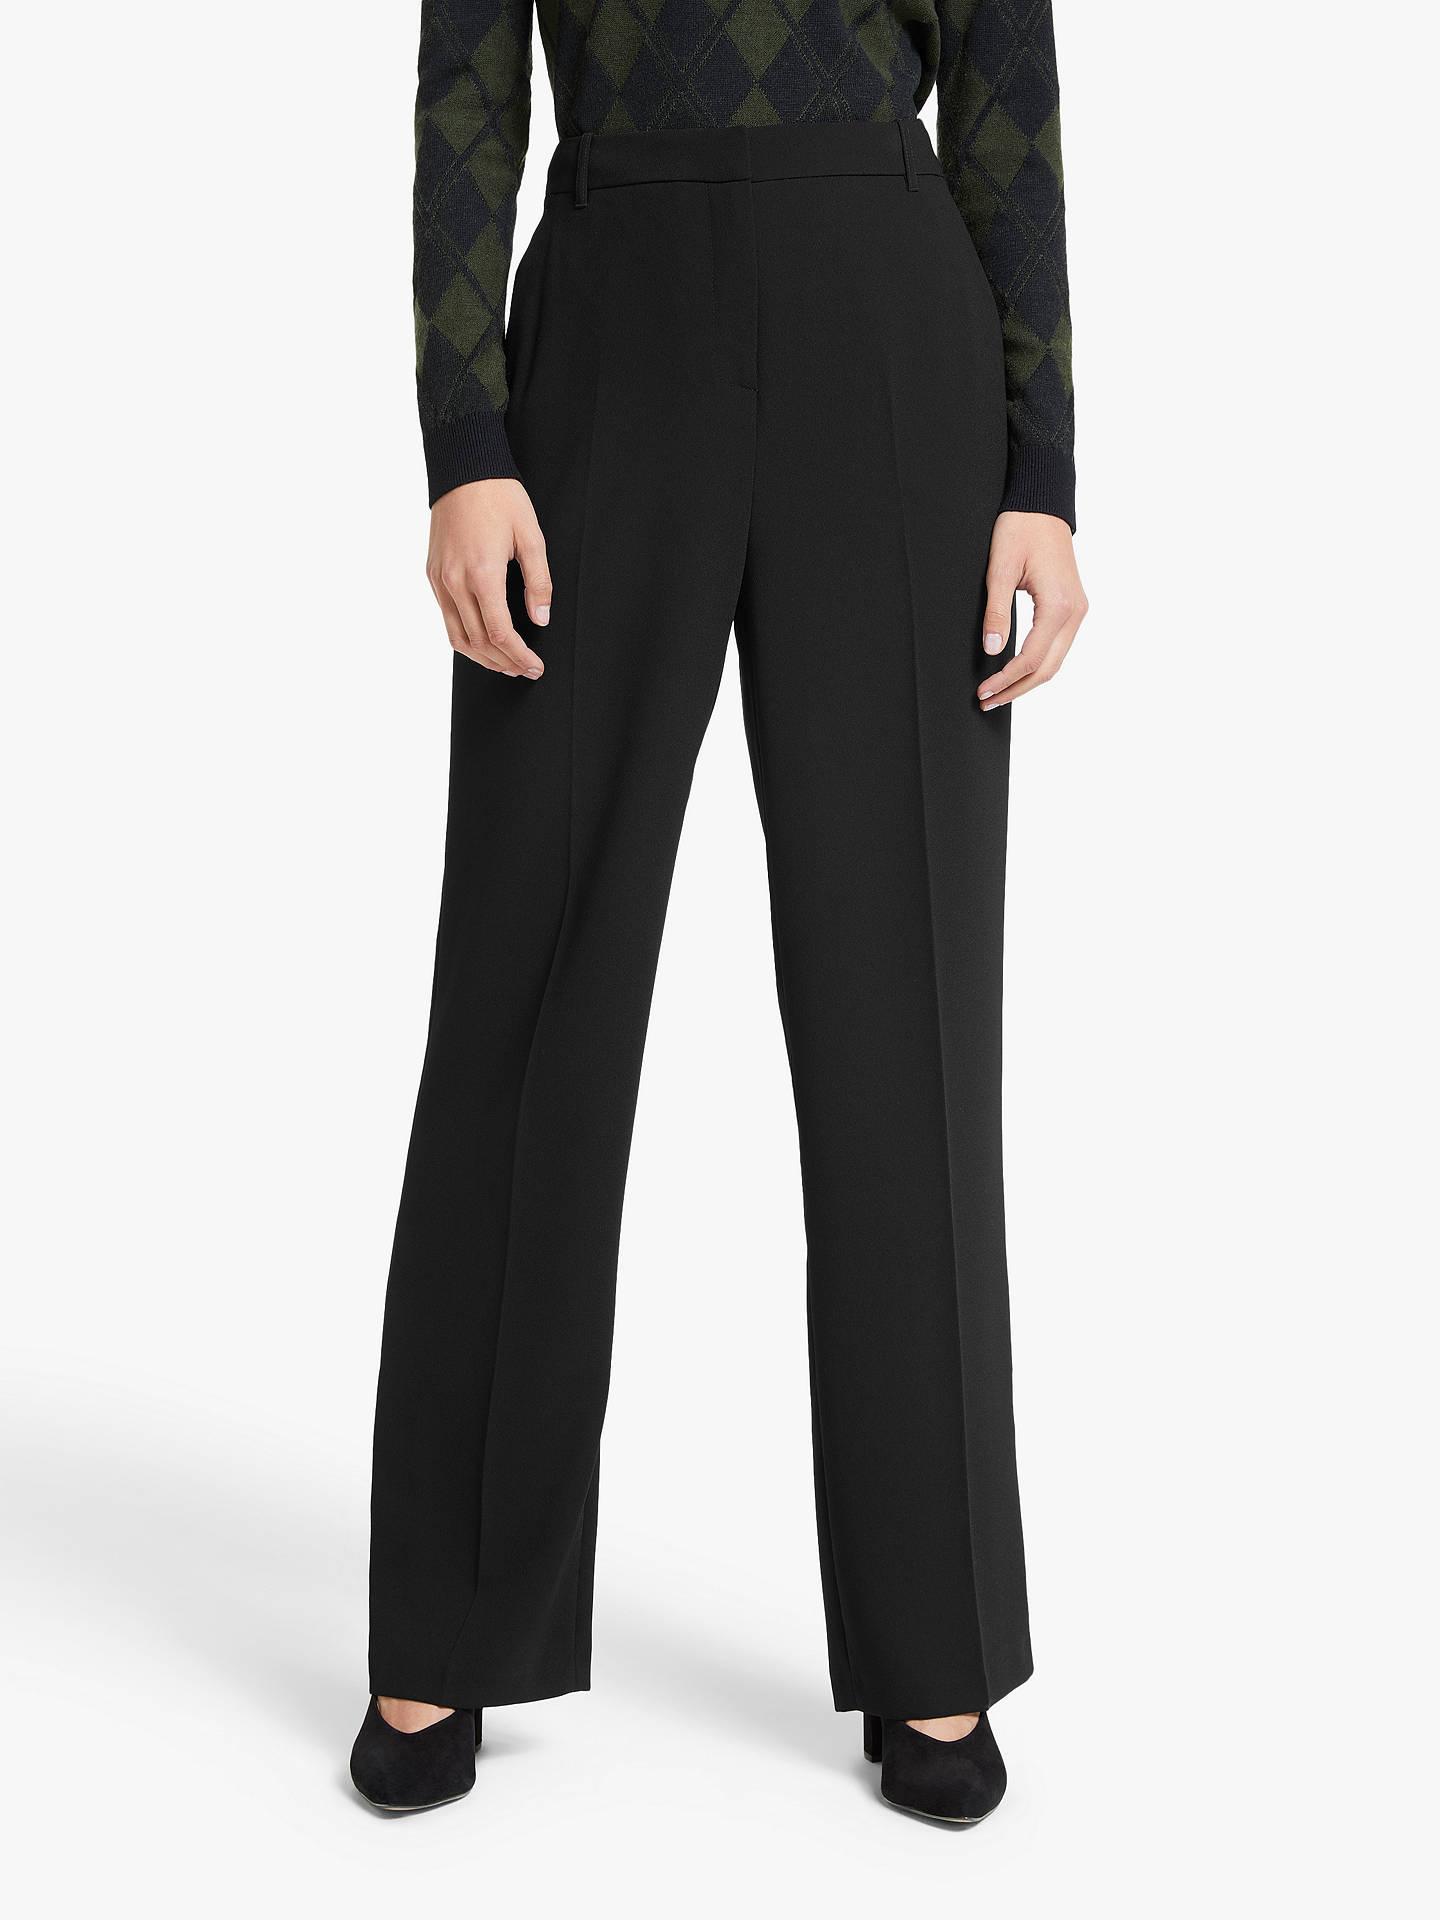 John Lewis & Partners Crop Tailored Trousers, Black by John Lewis & Partners